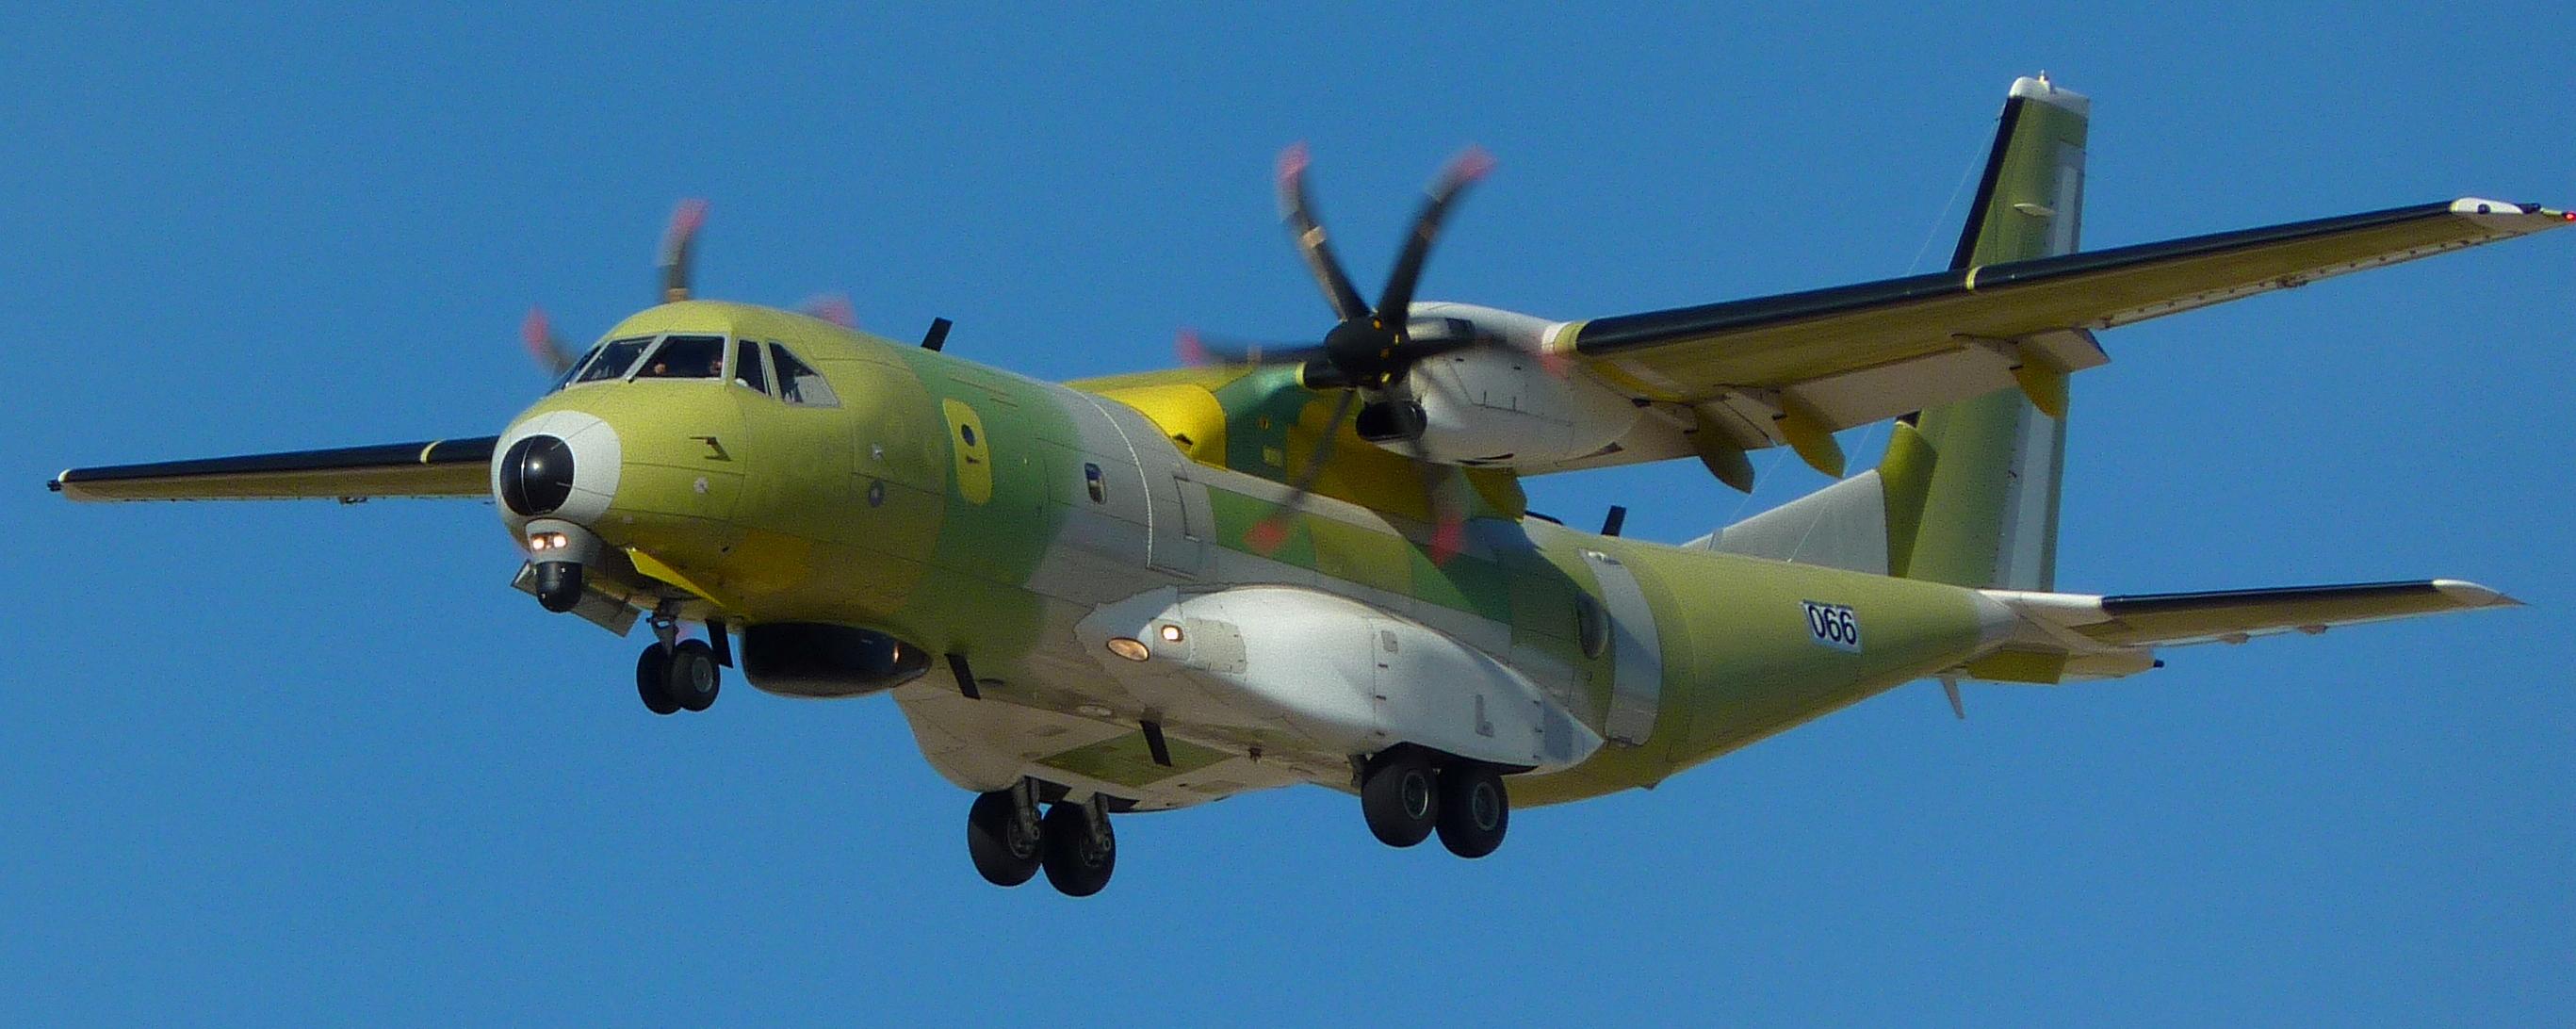 File:C-295 Persuader (1).JPG